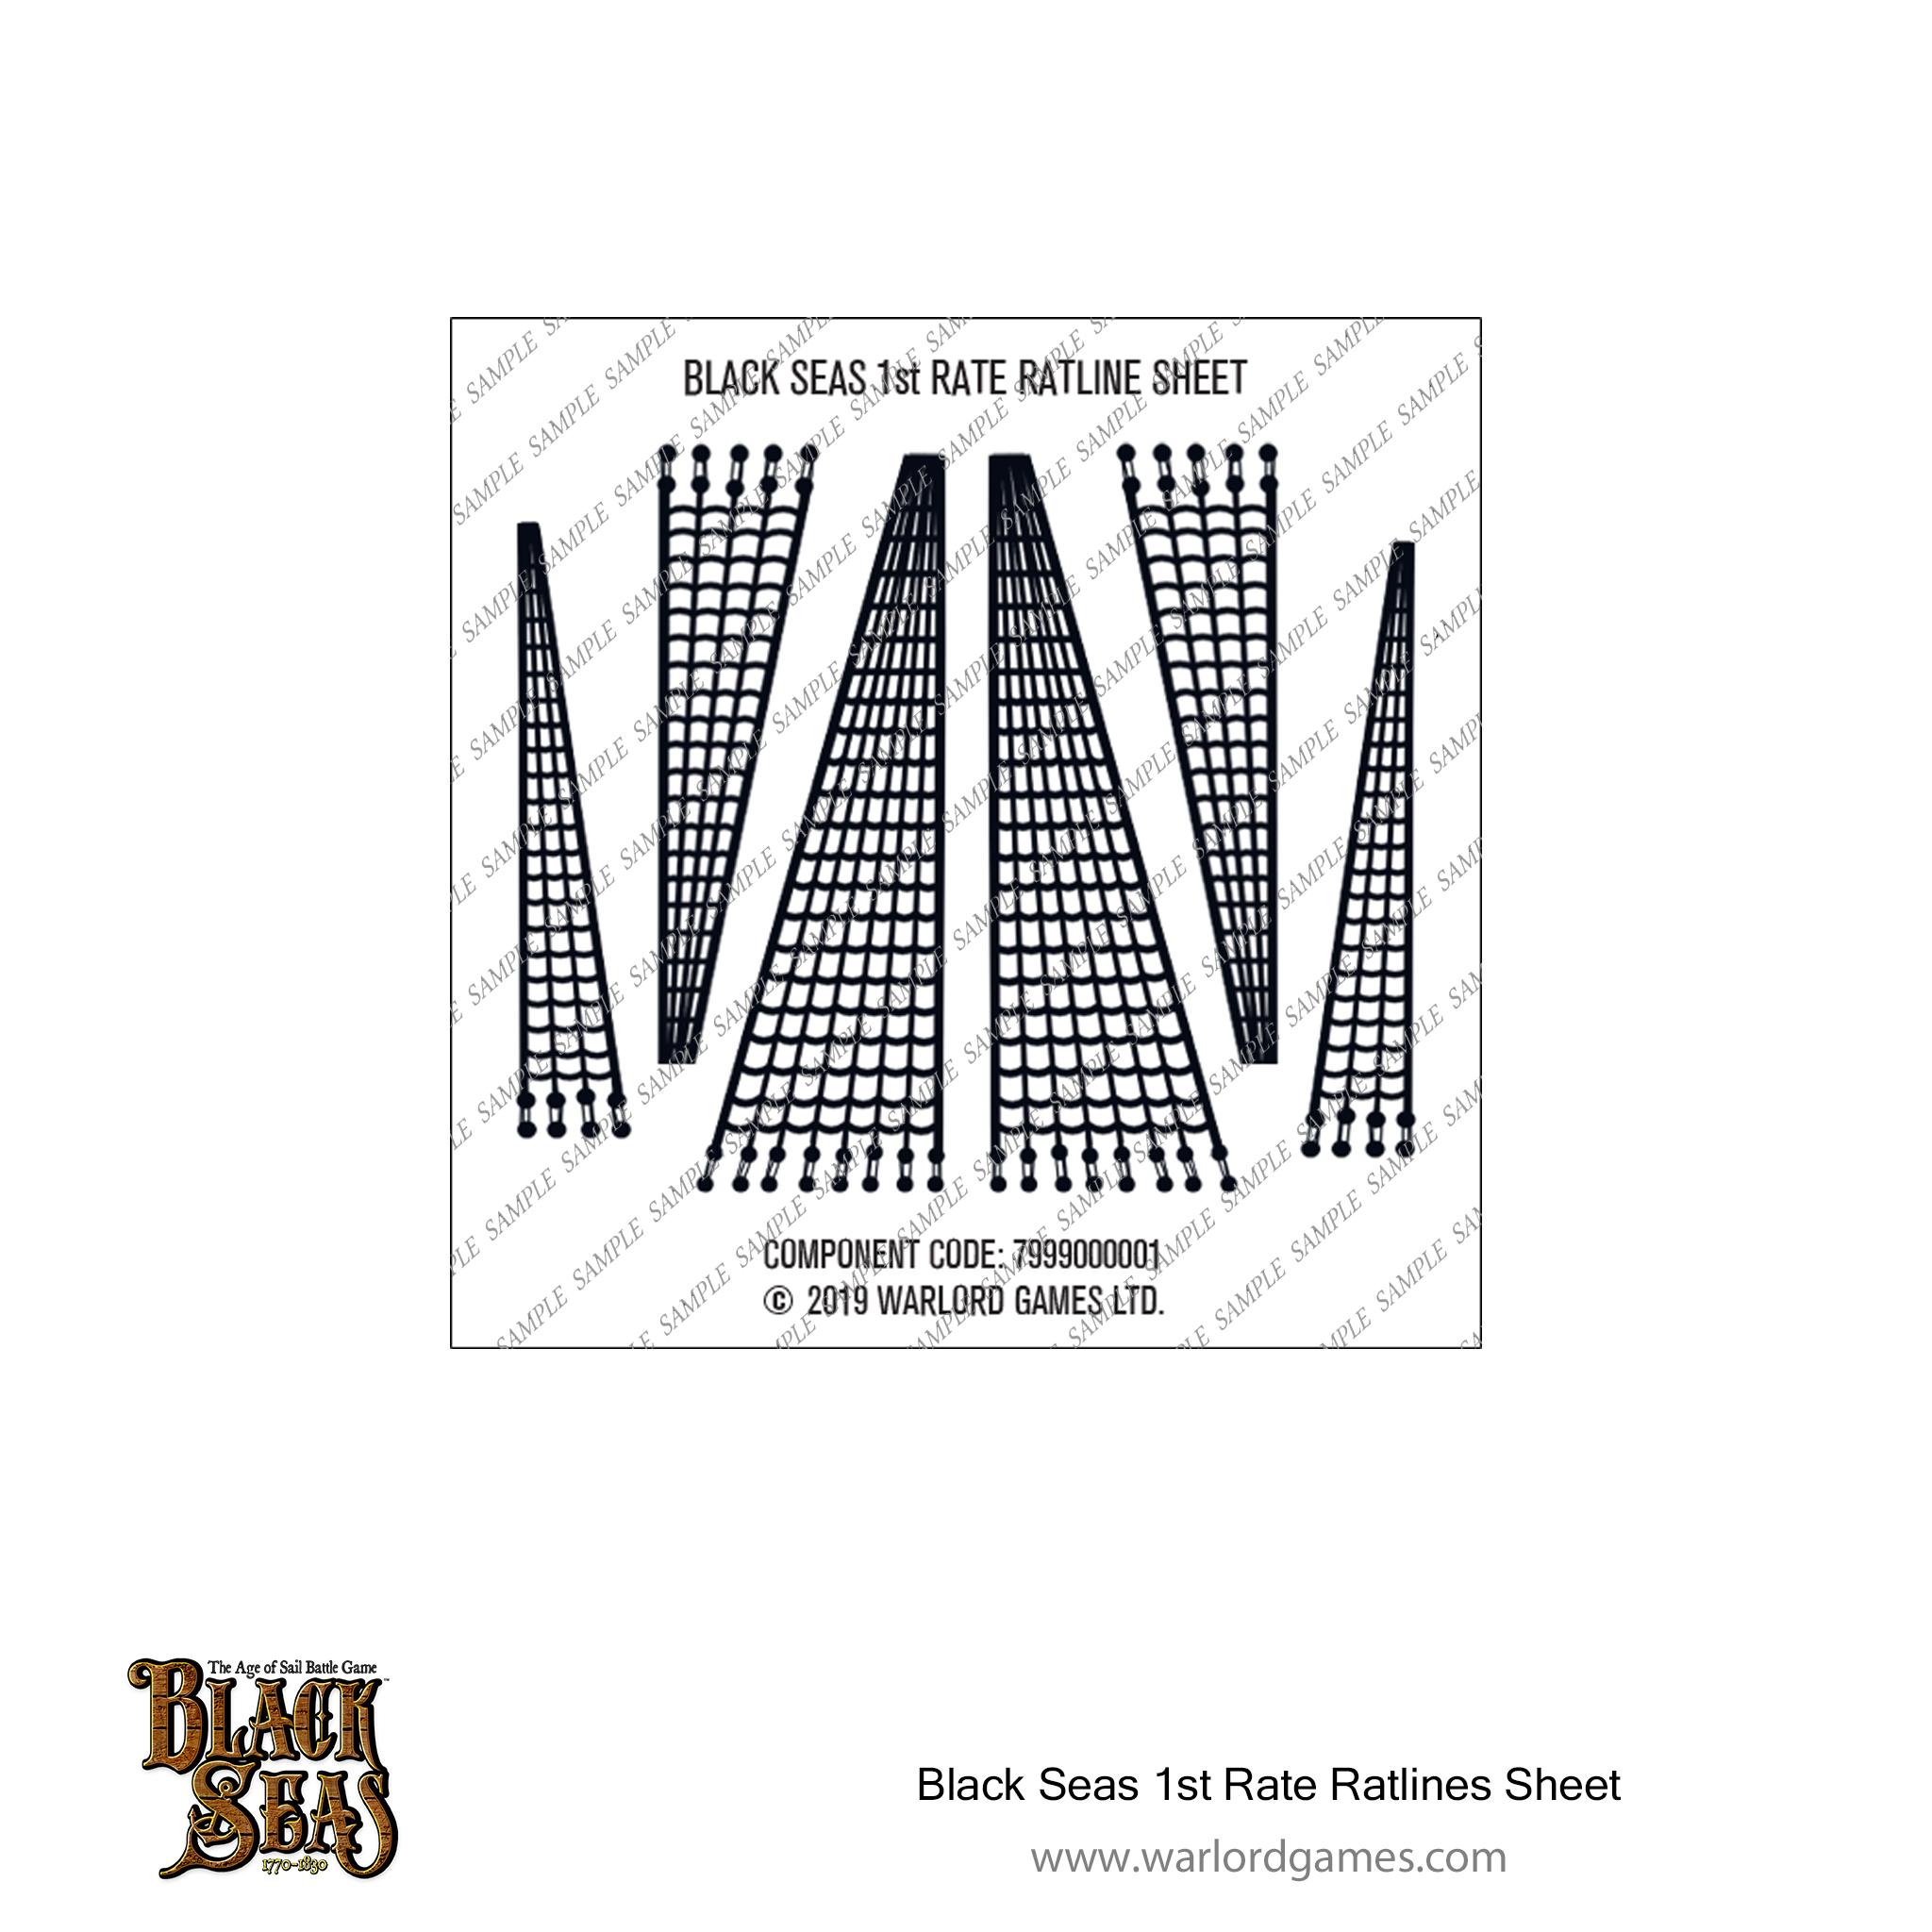 Black Seas 1st Rate ratlines sheet